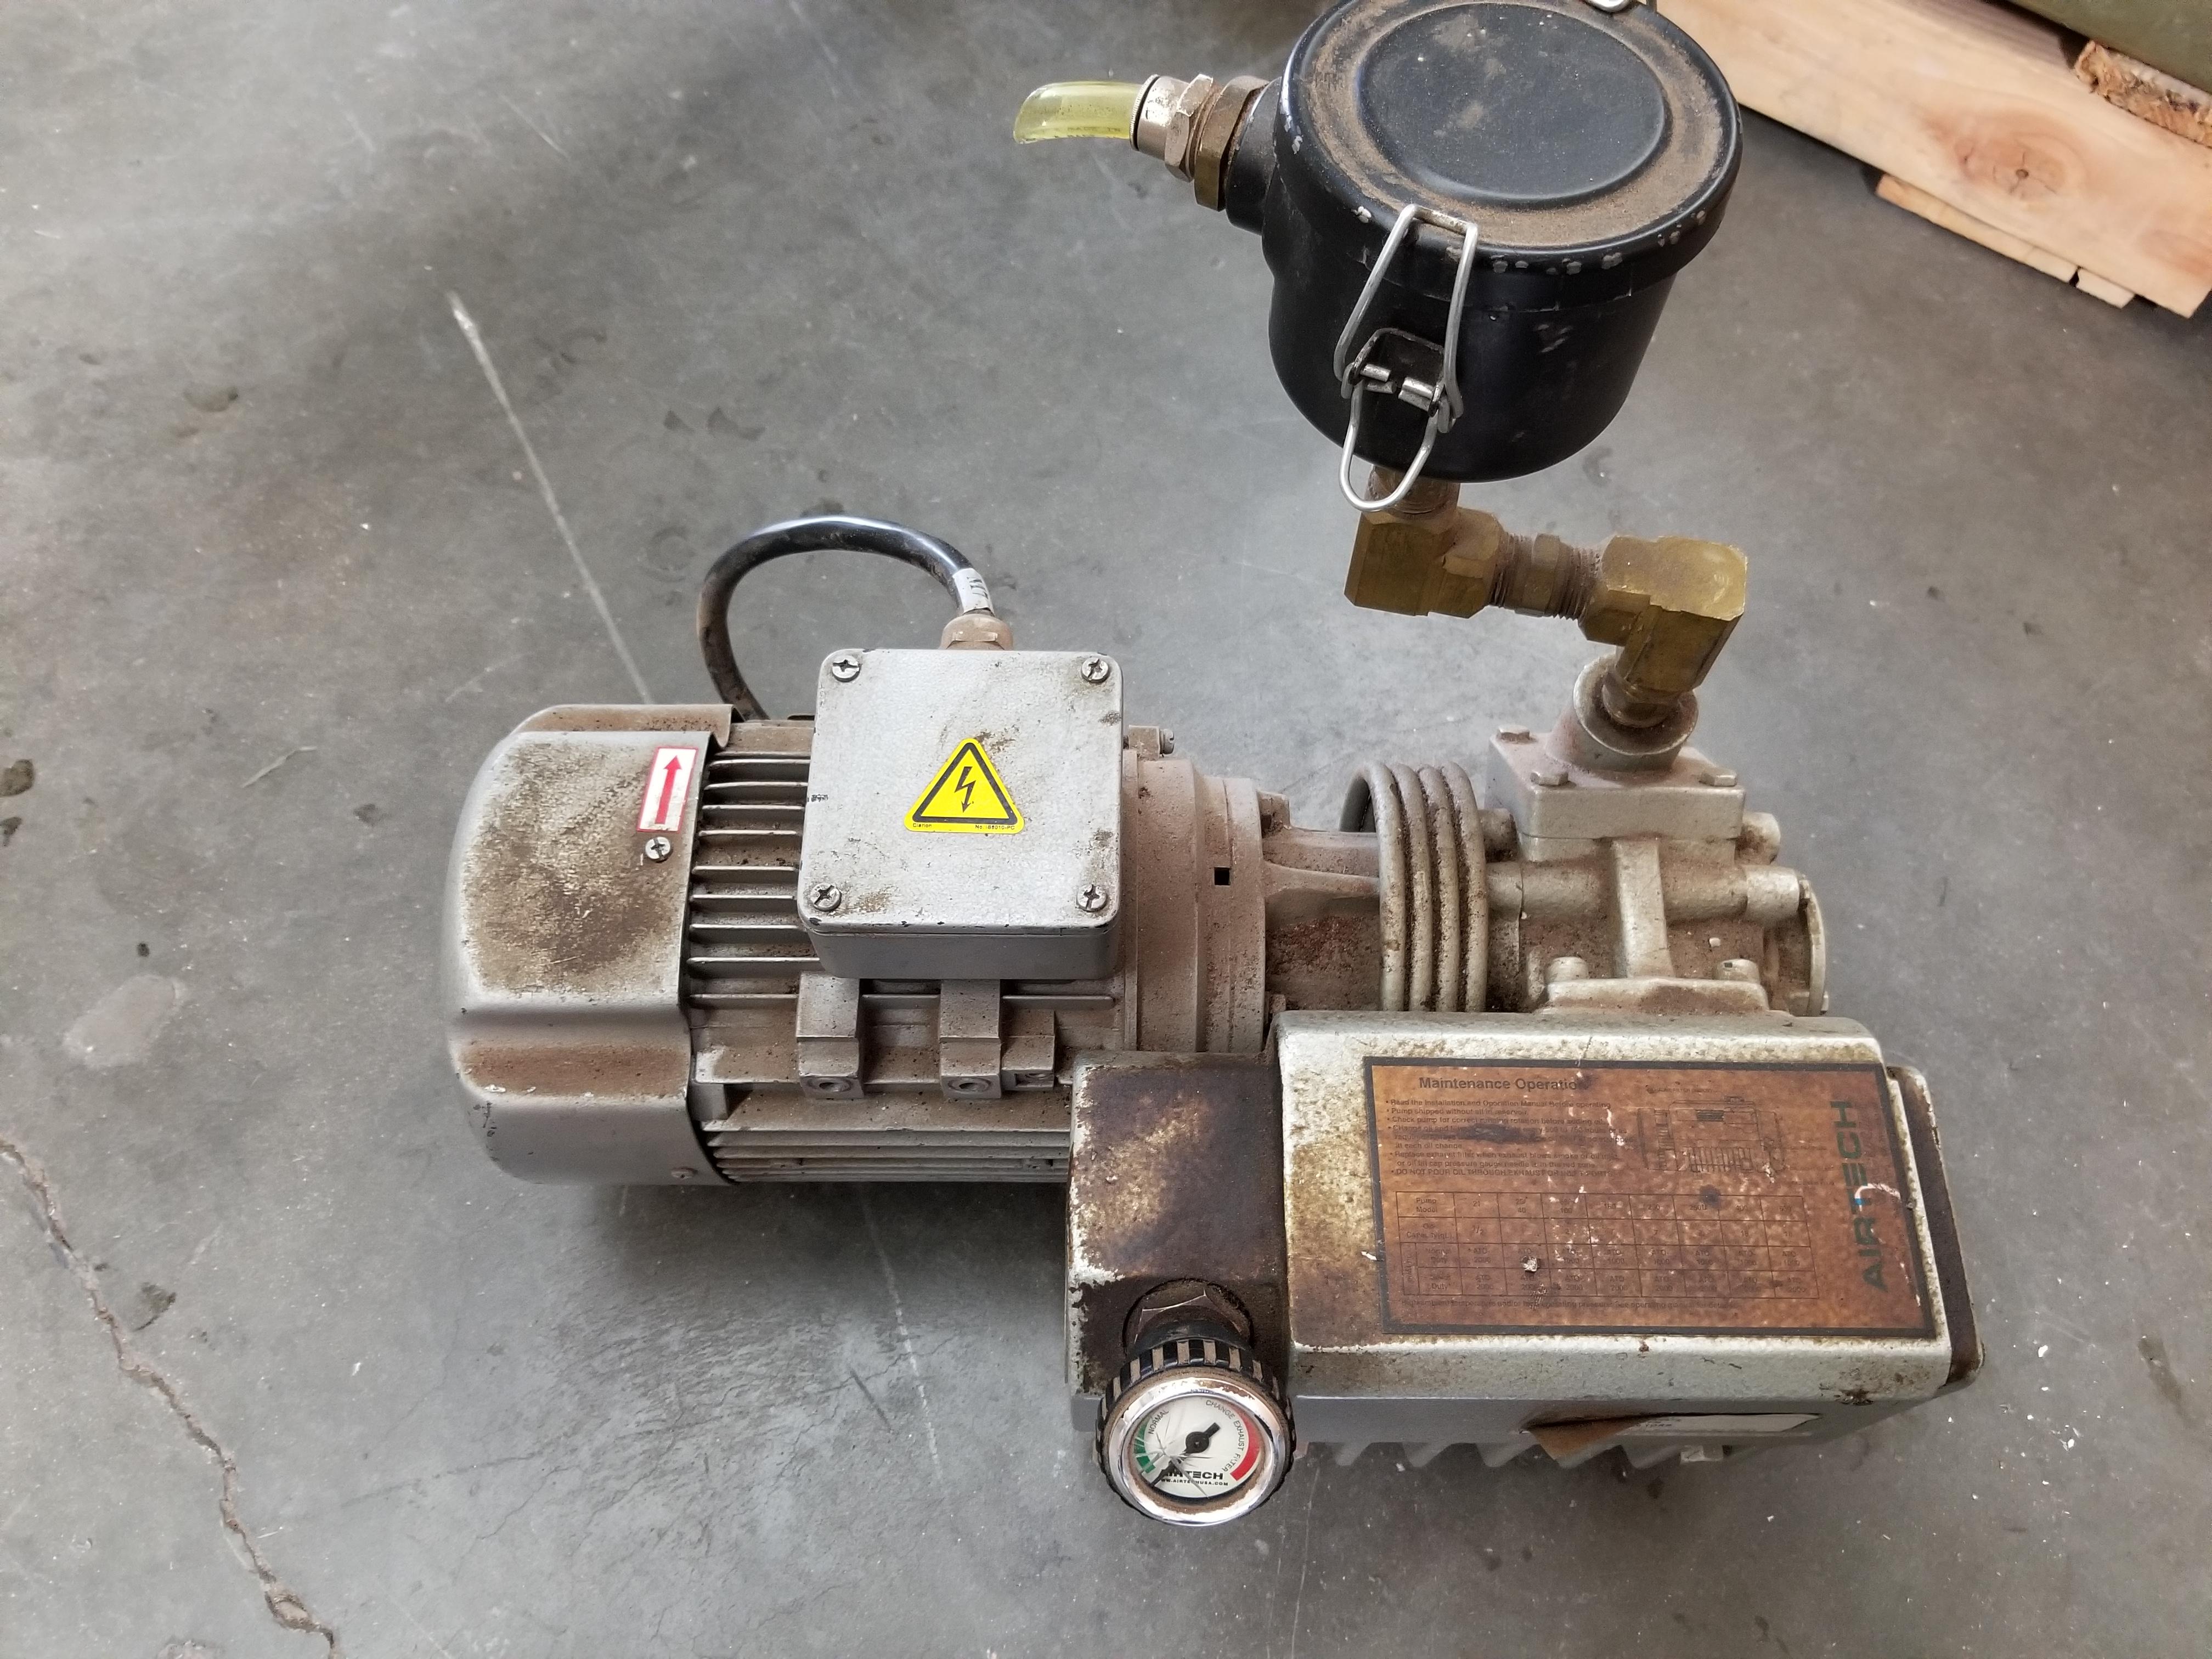 Lot 59 - AIRTECH VACUUM PUMP WITH MARATHON ELECTRIC MOTOR